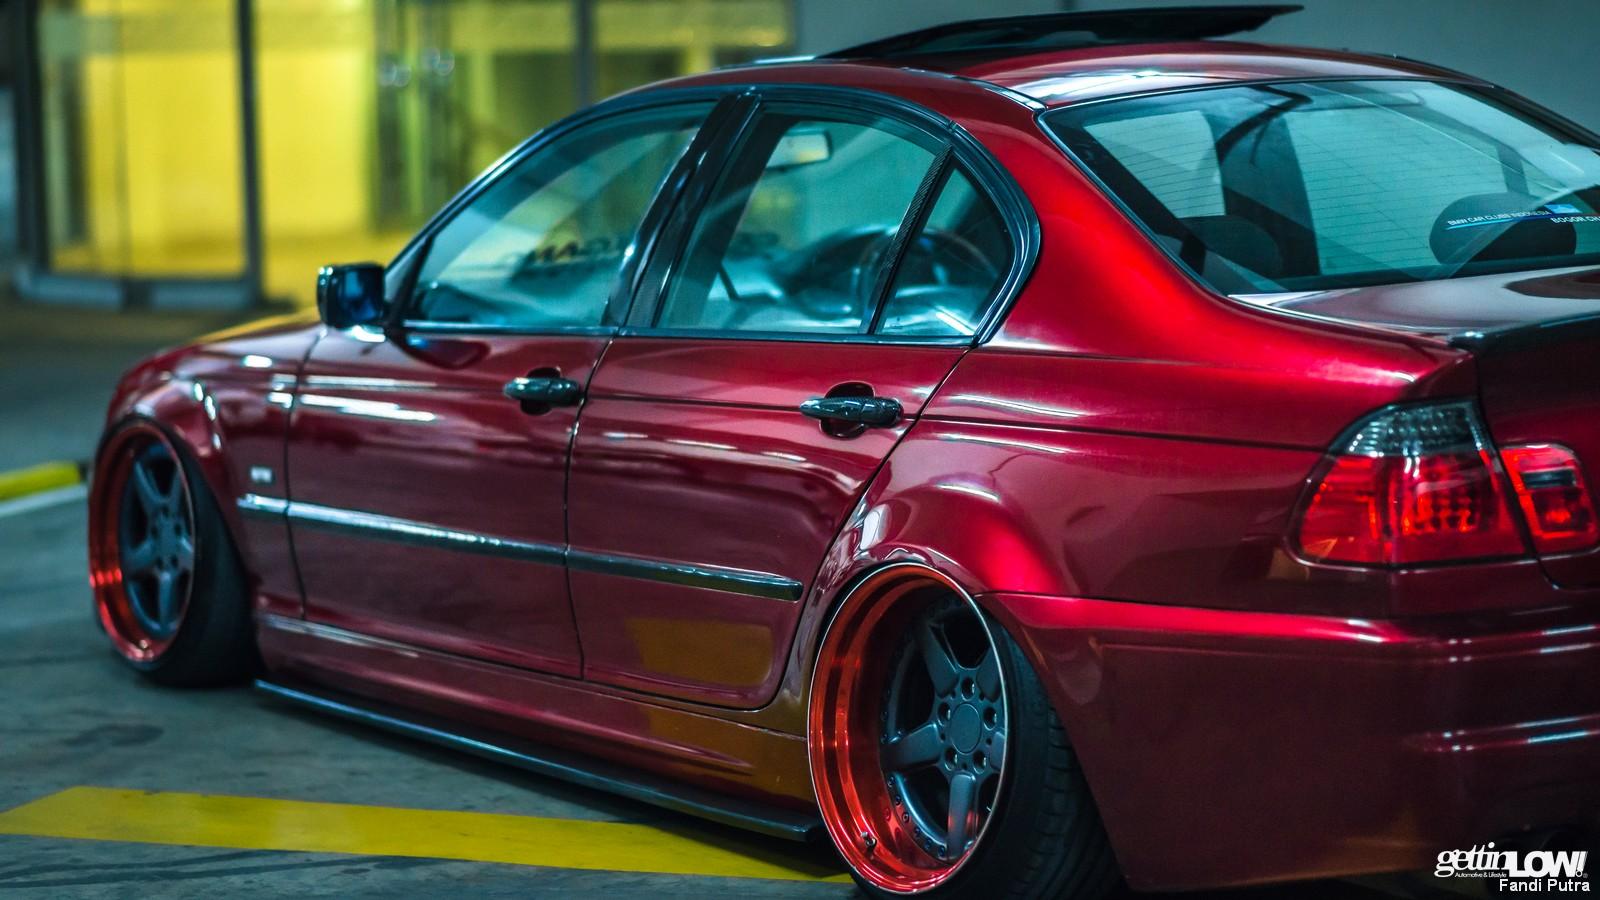 BMW-Maroon-gesrex_15